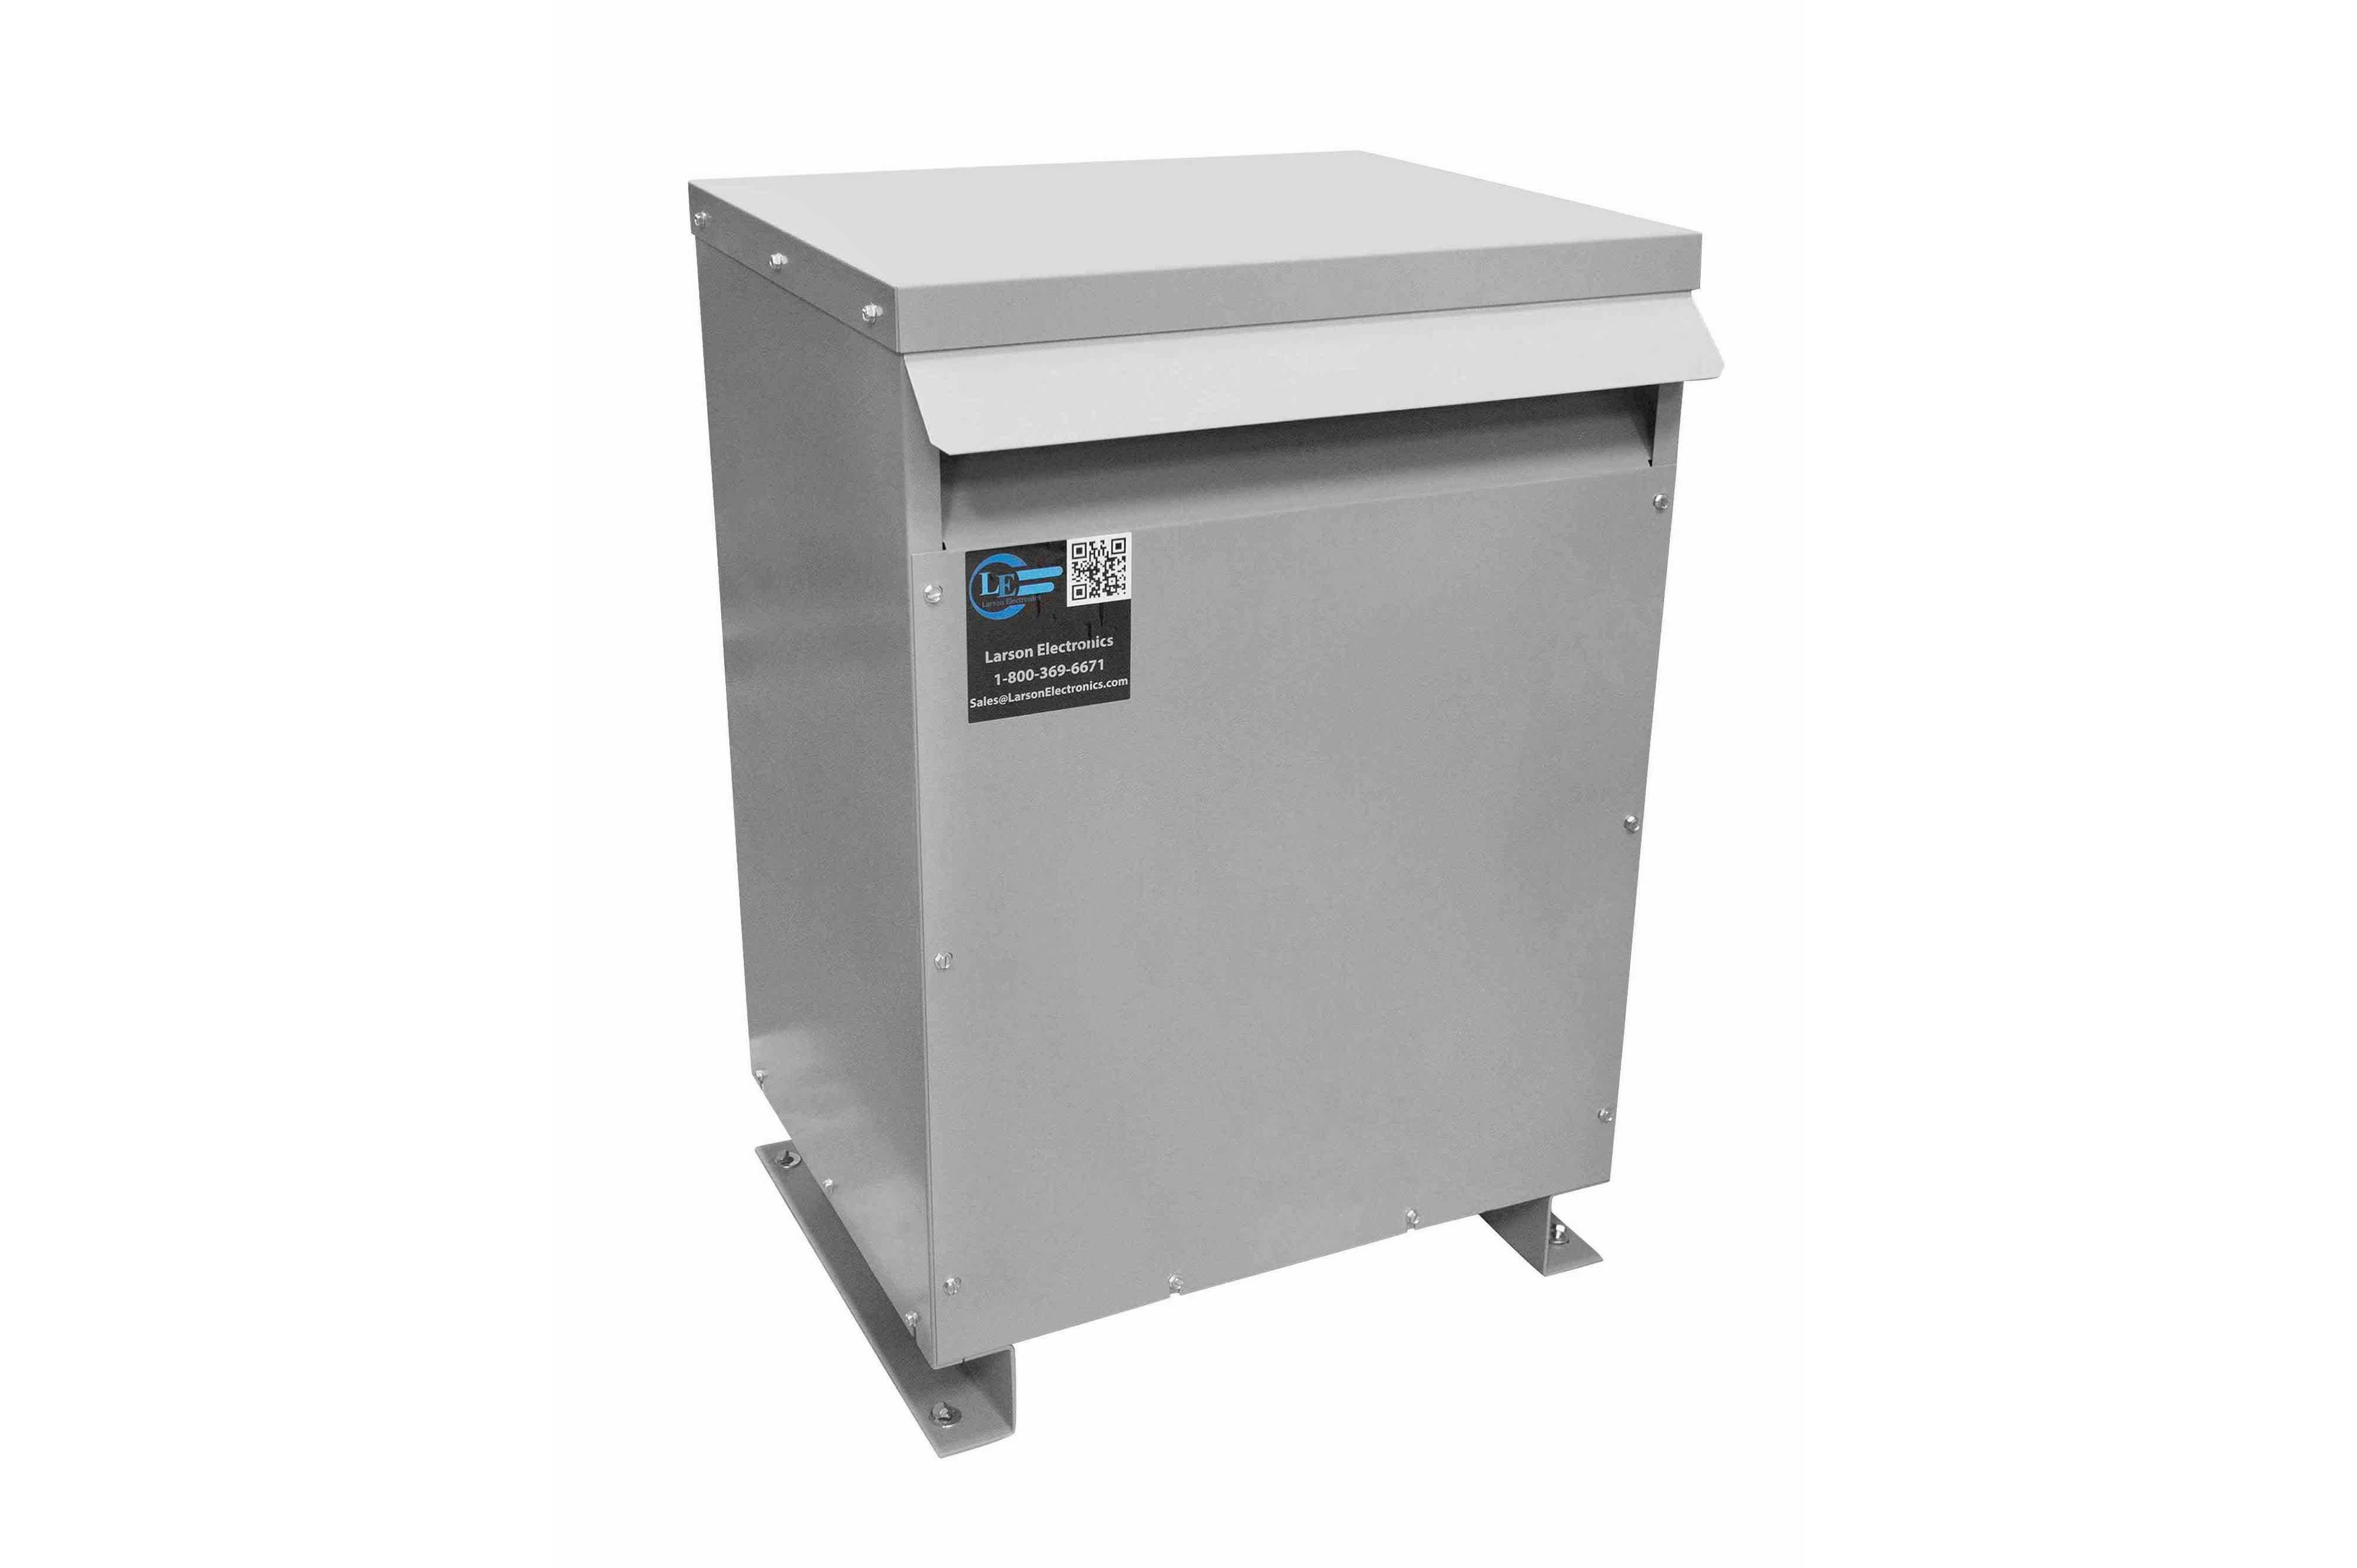 225 kVA 3PH Isolation Transformer, 600V Wye Primary, 460Y/266 Wye-N Secondary, N3R, Ventilated, 60 Hz